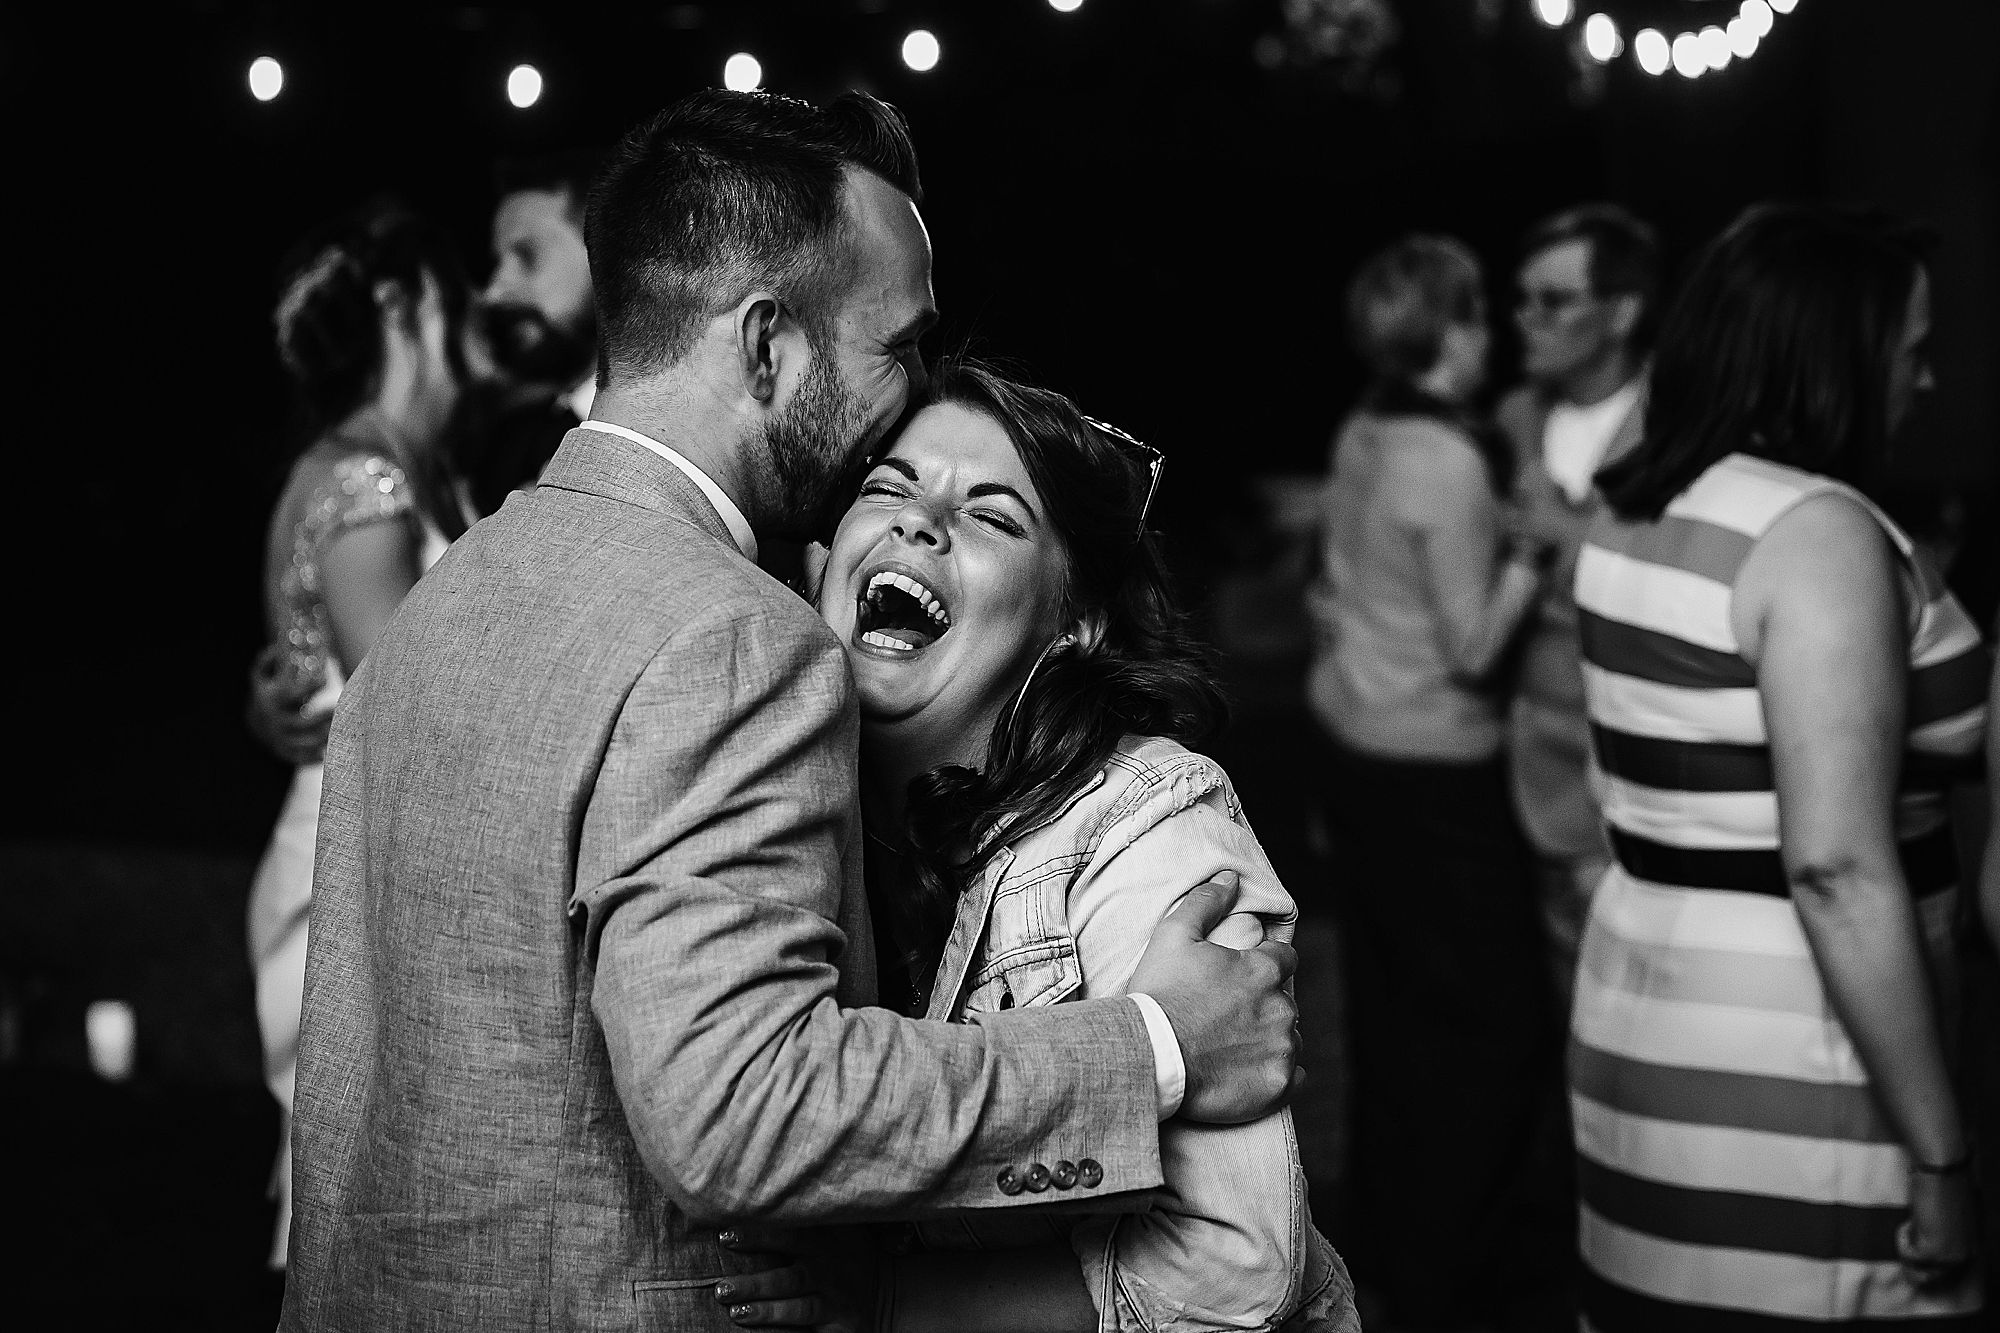 Chateau Rieutort wedding laugh